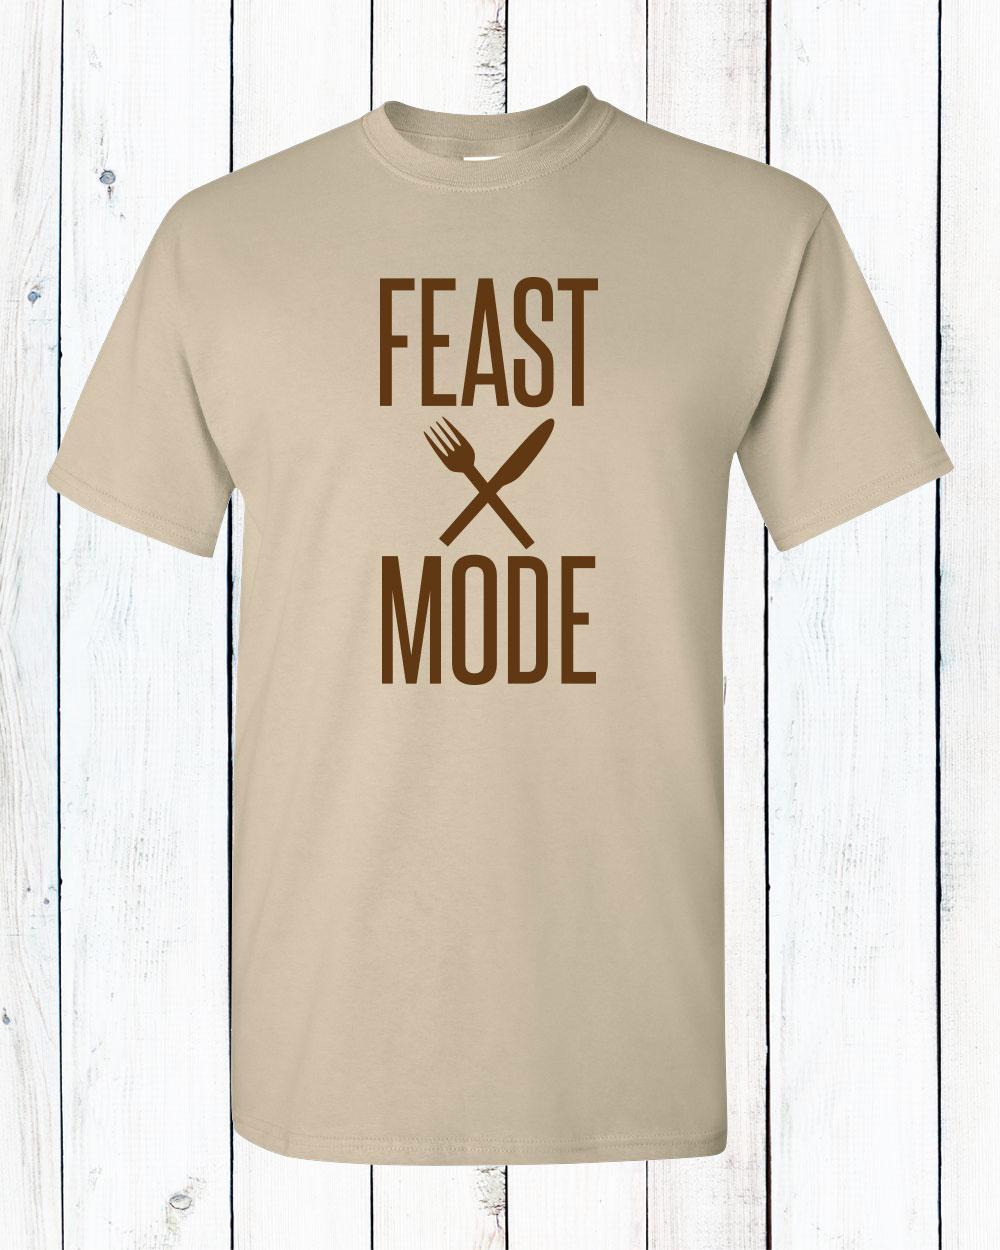 feast-mode.jpg